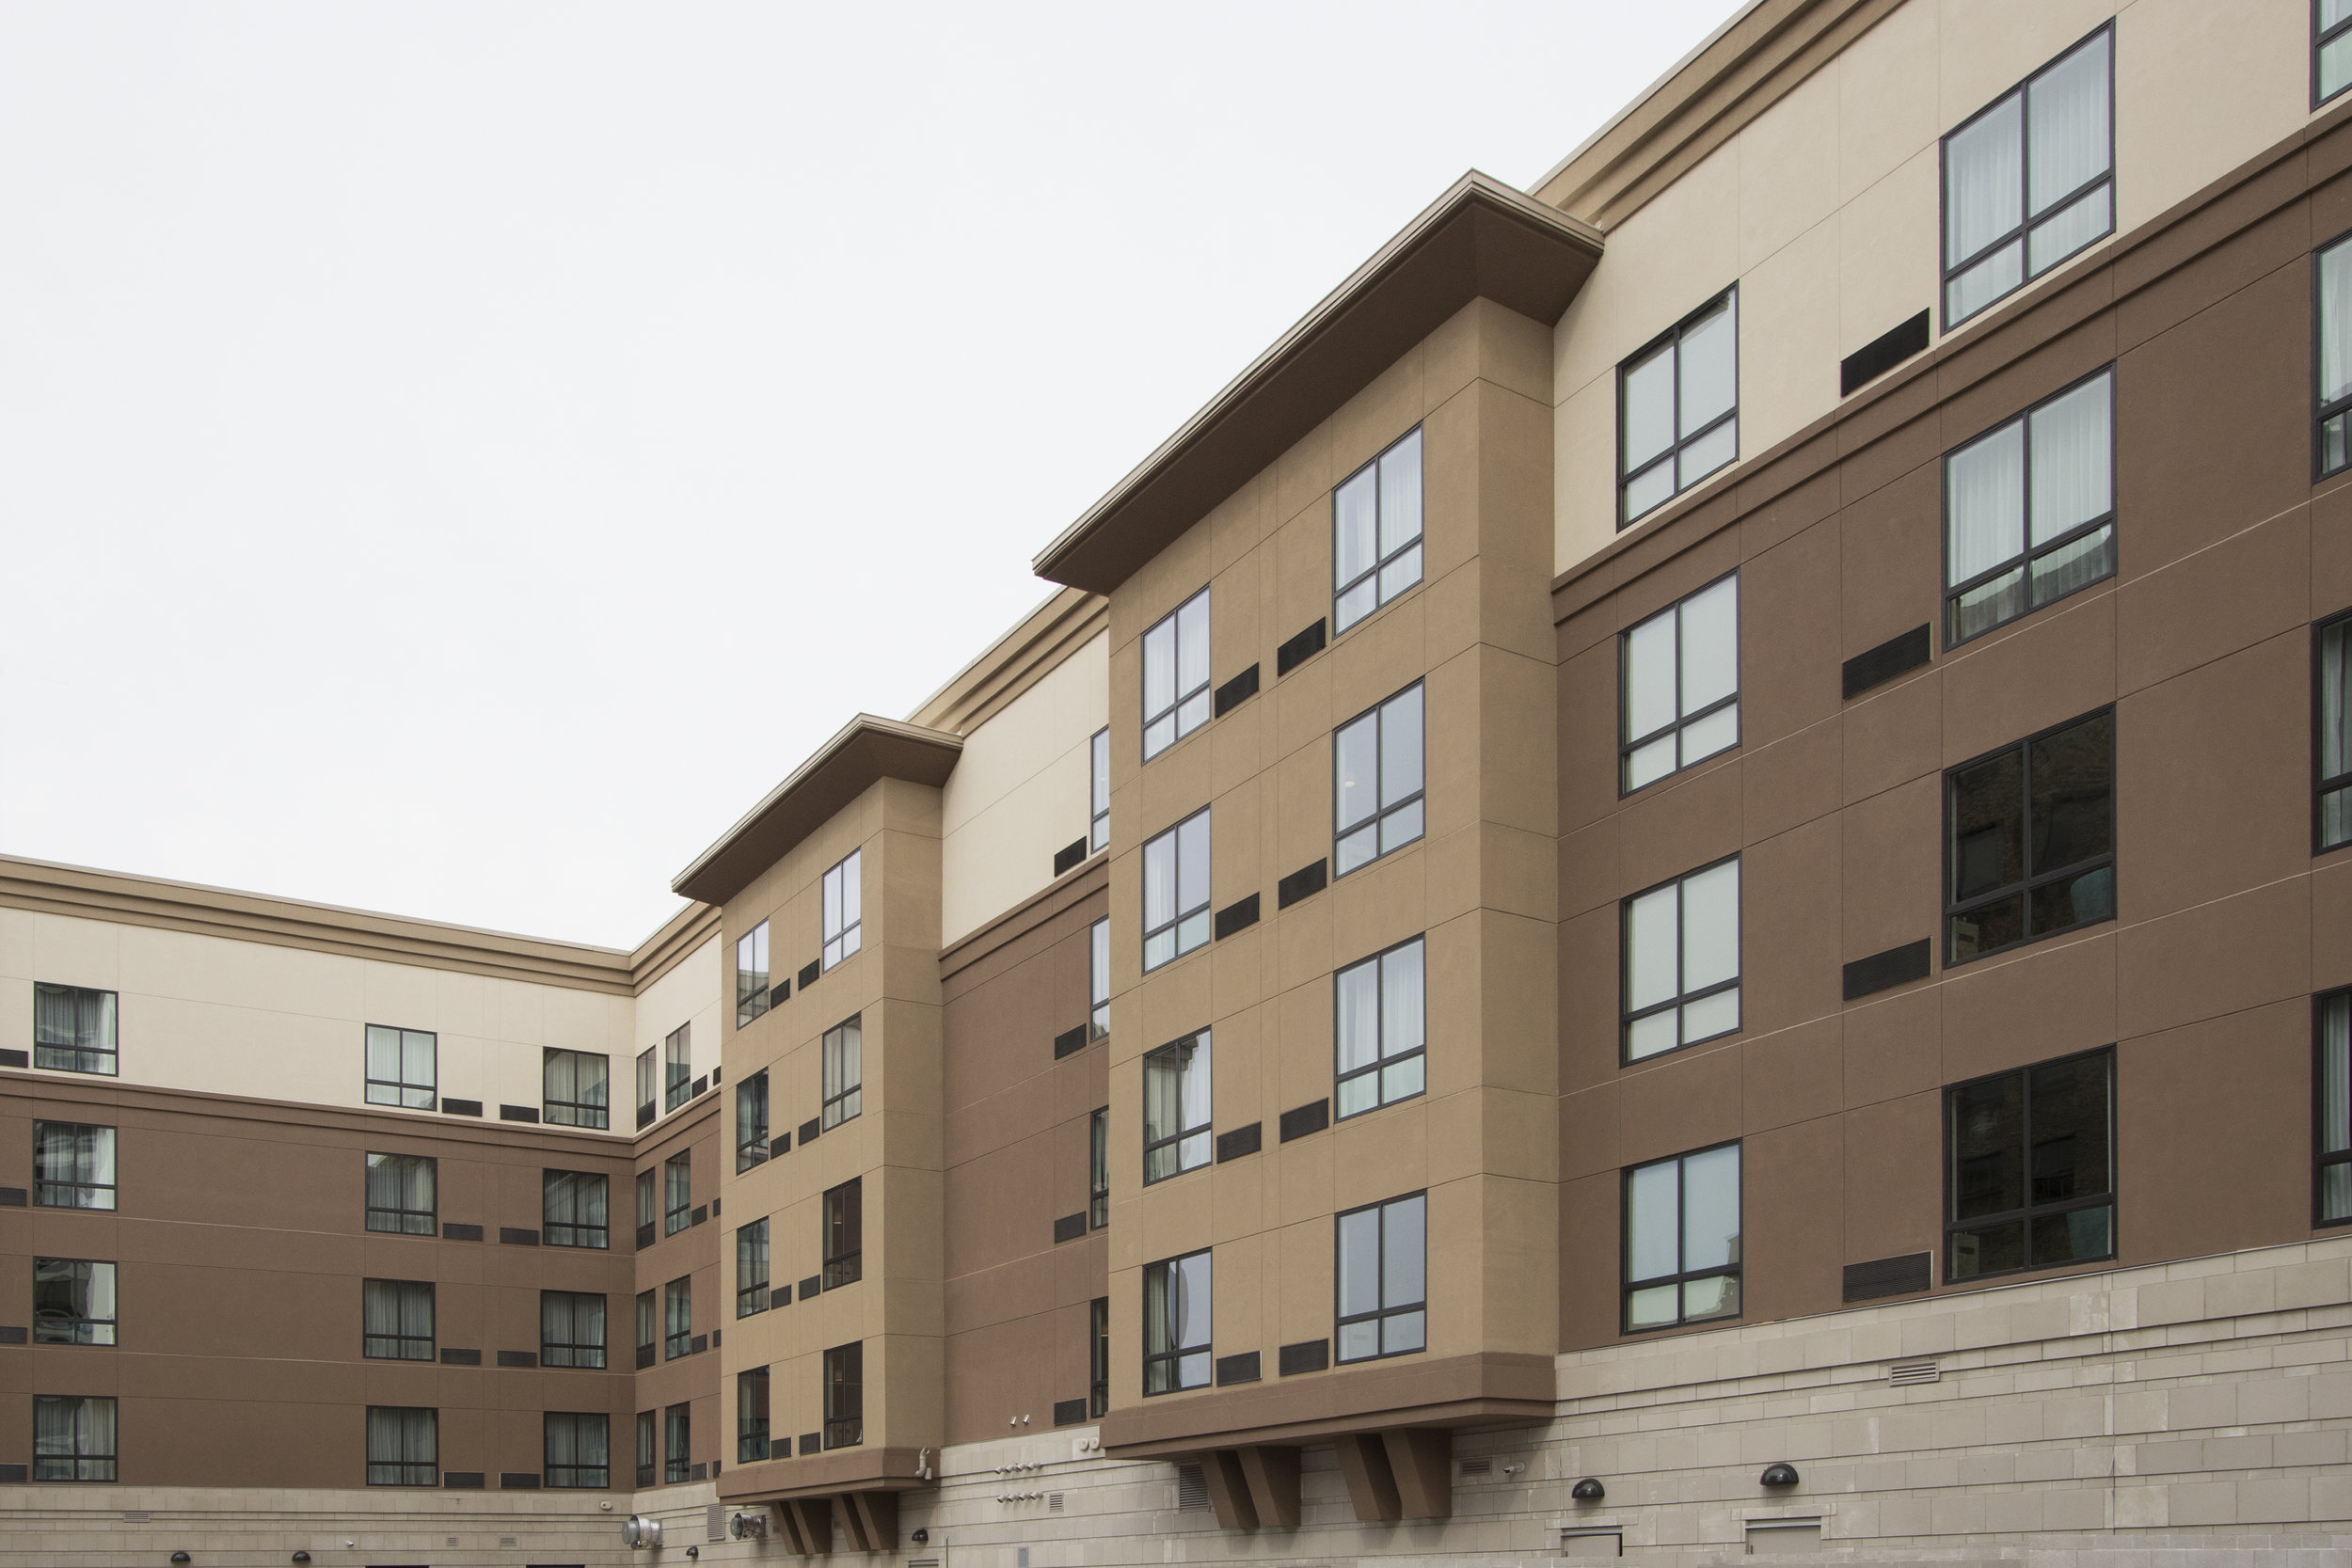 Courtyard Marriott Rear View.jpg